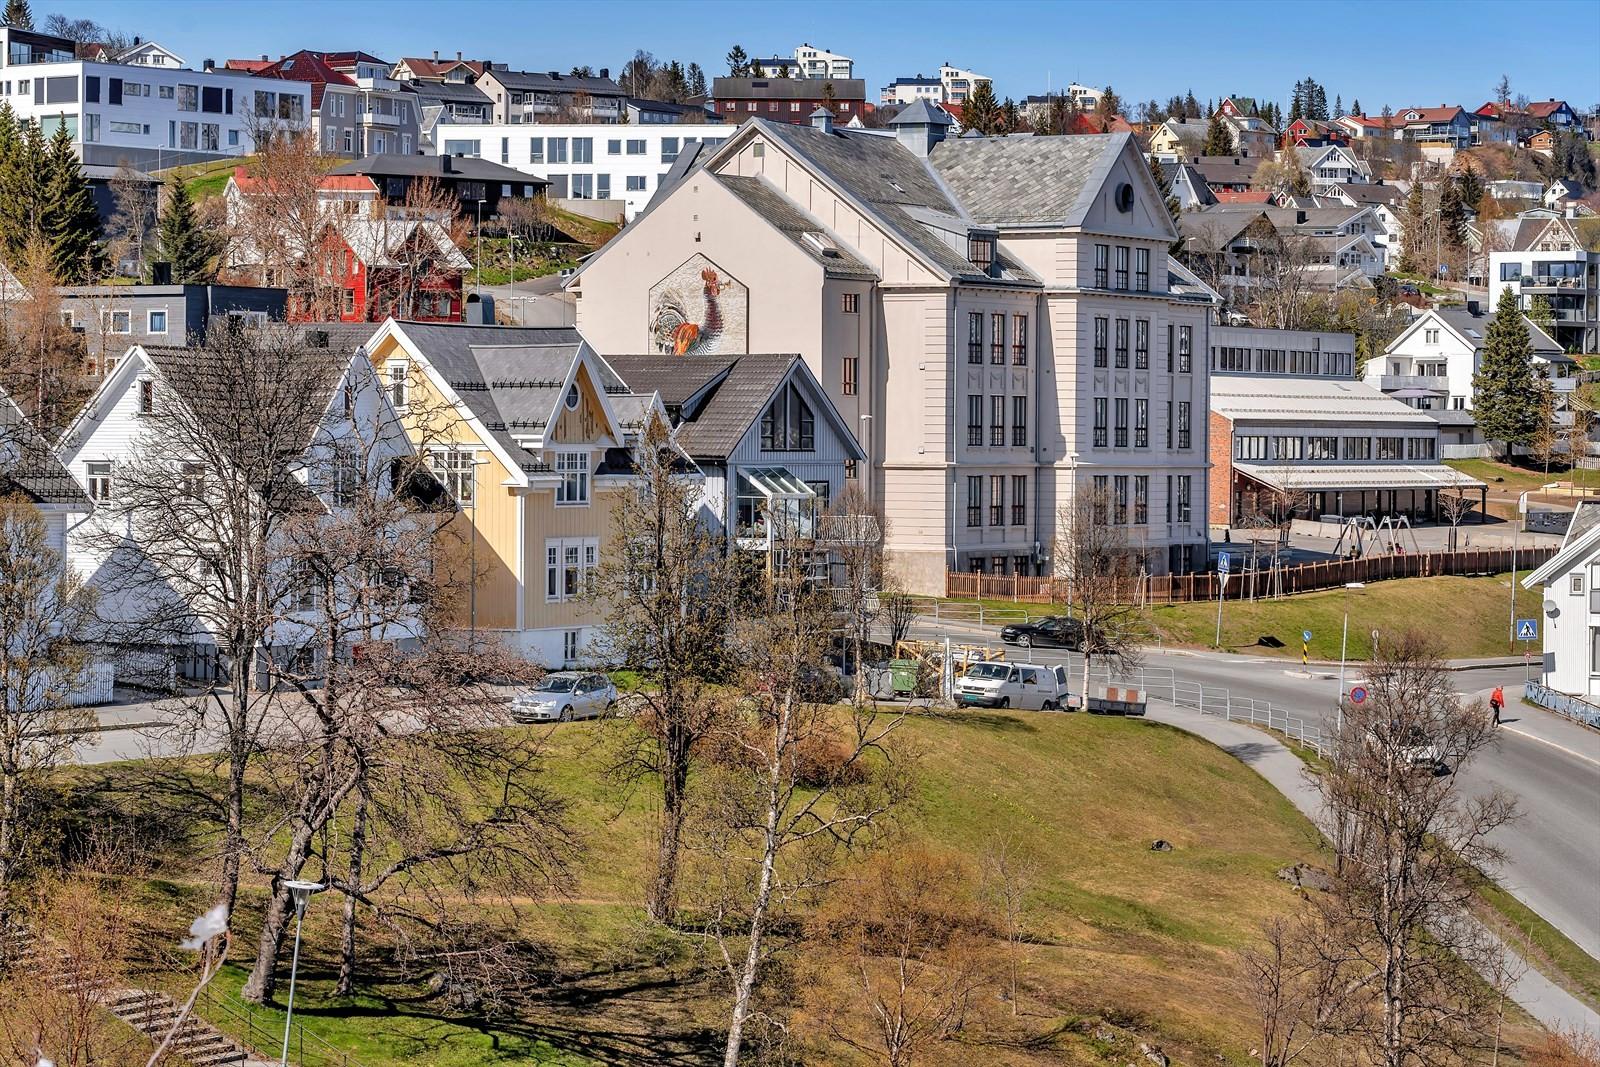 Gyllenborg